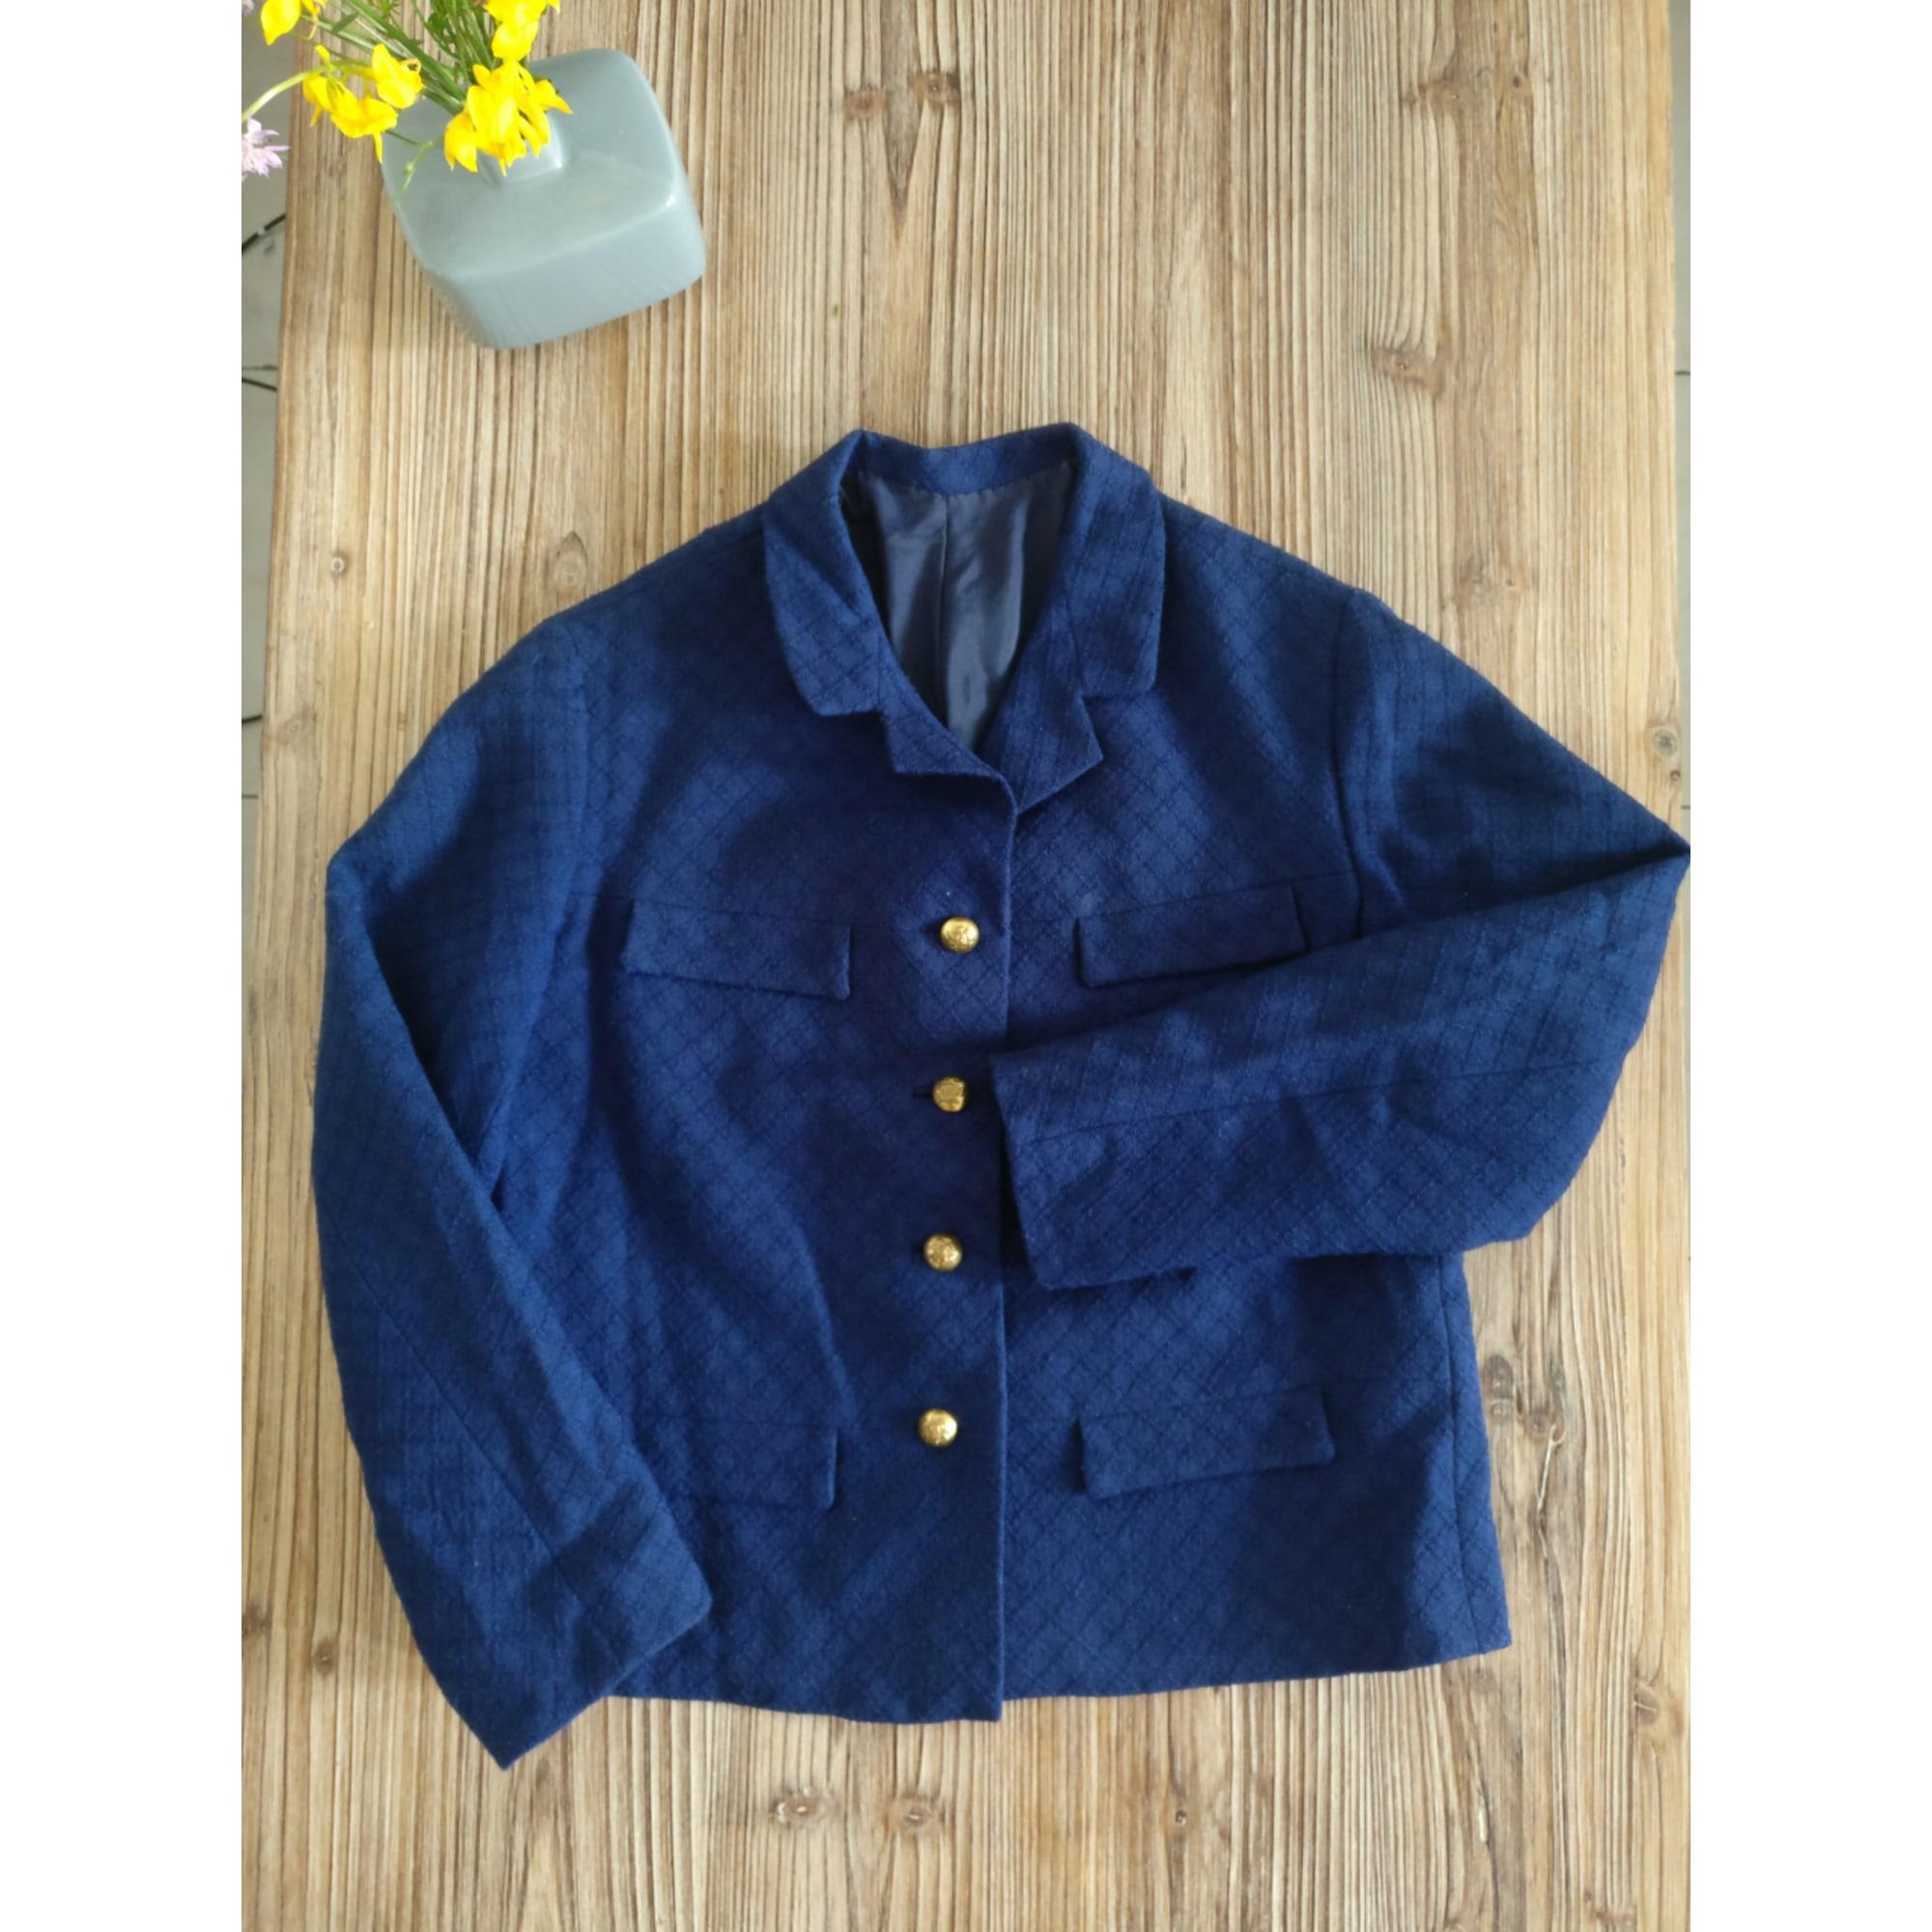 Veste VINTAGE Bleu, bleu marine, bleu turquoise